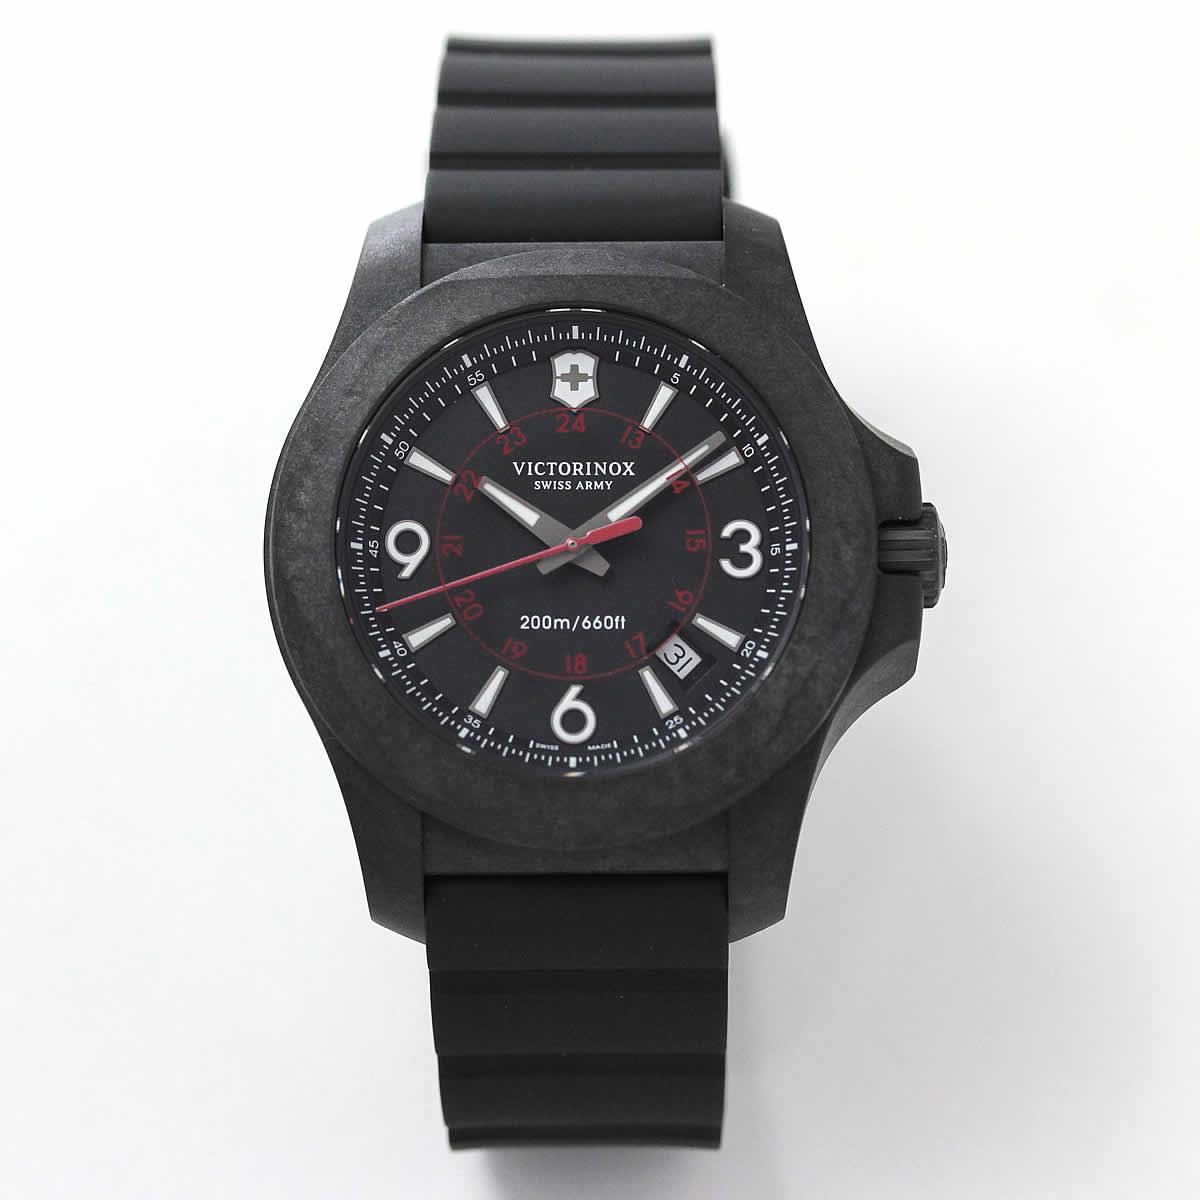 VICTORINOX SWISSARMY 腕時計 イノックス